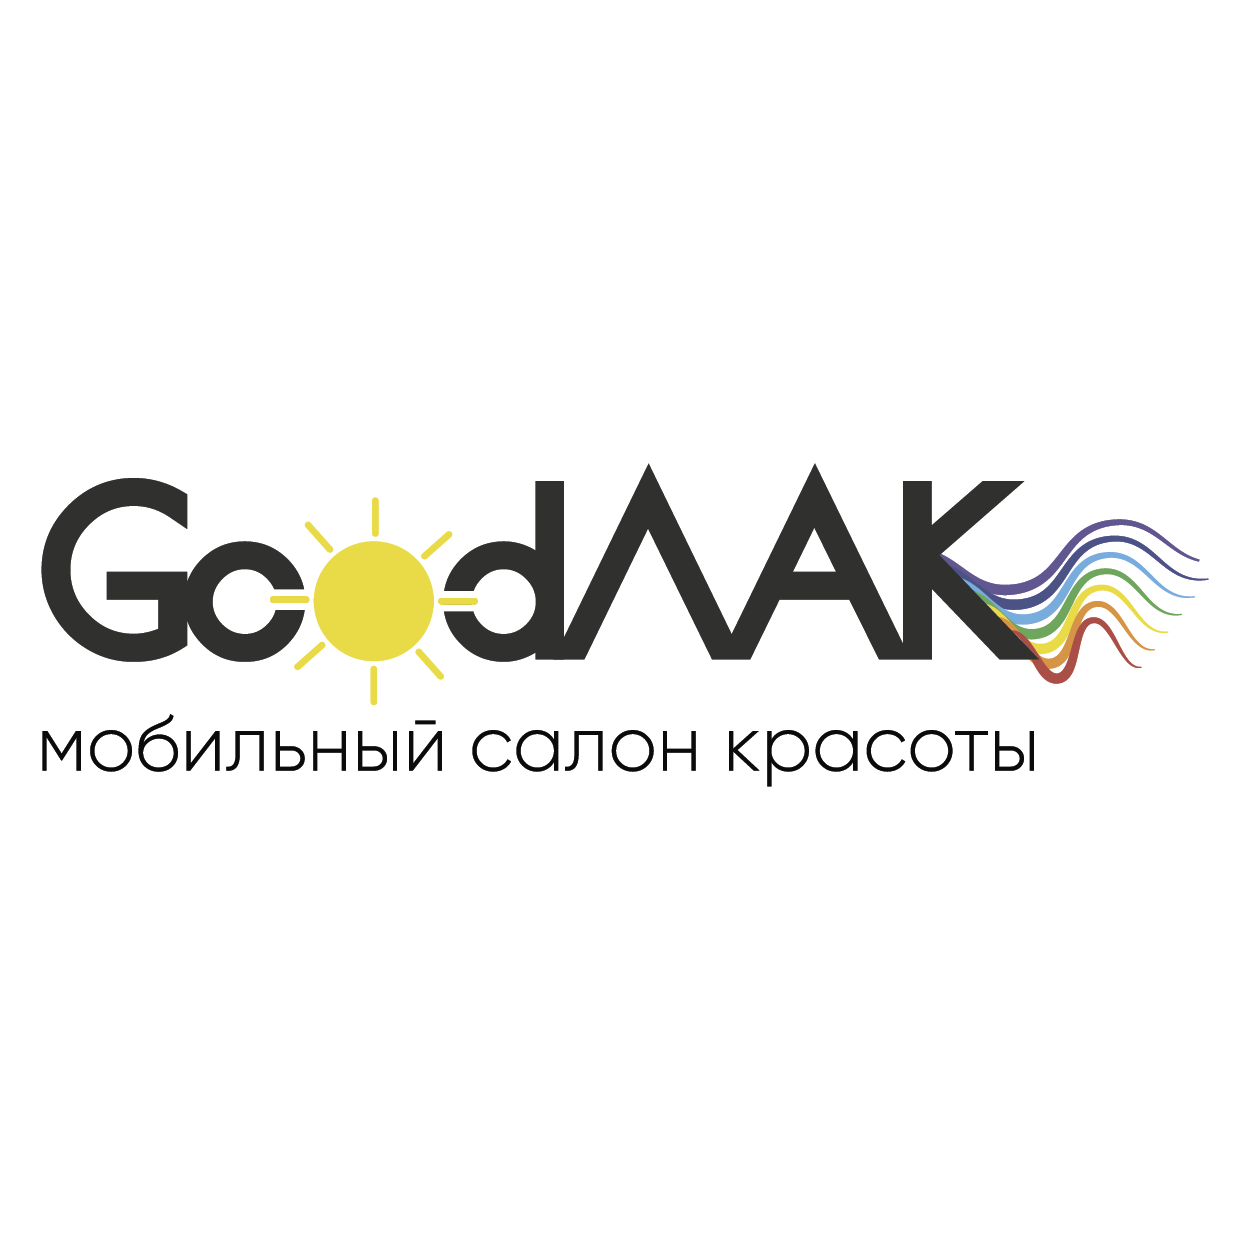 Мобильный салон красоты «GoodЛАК»